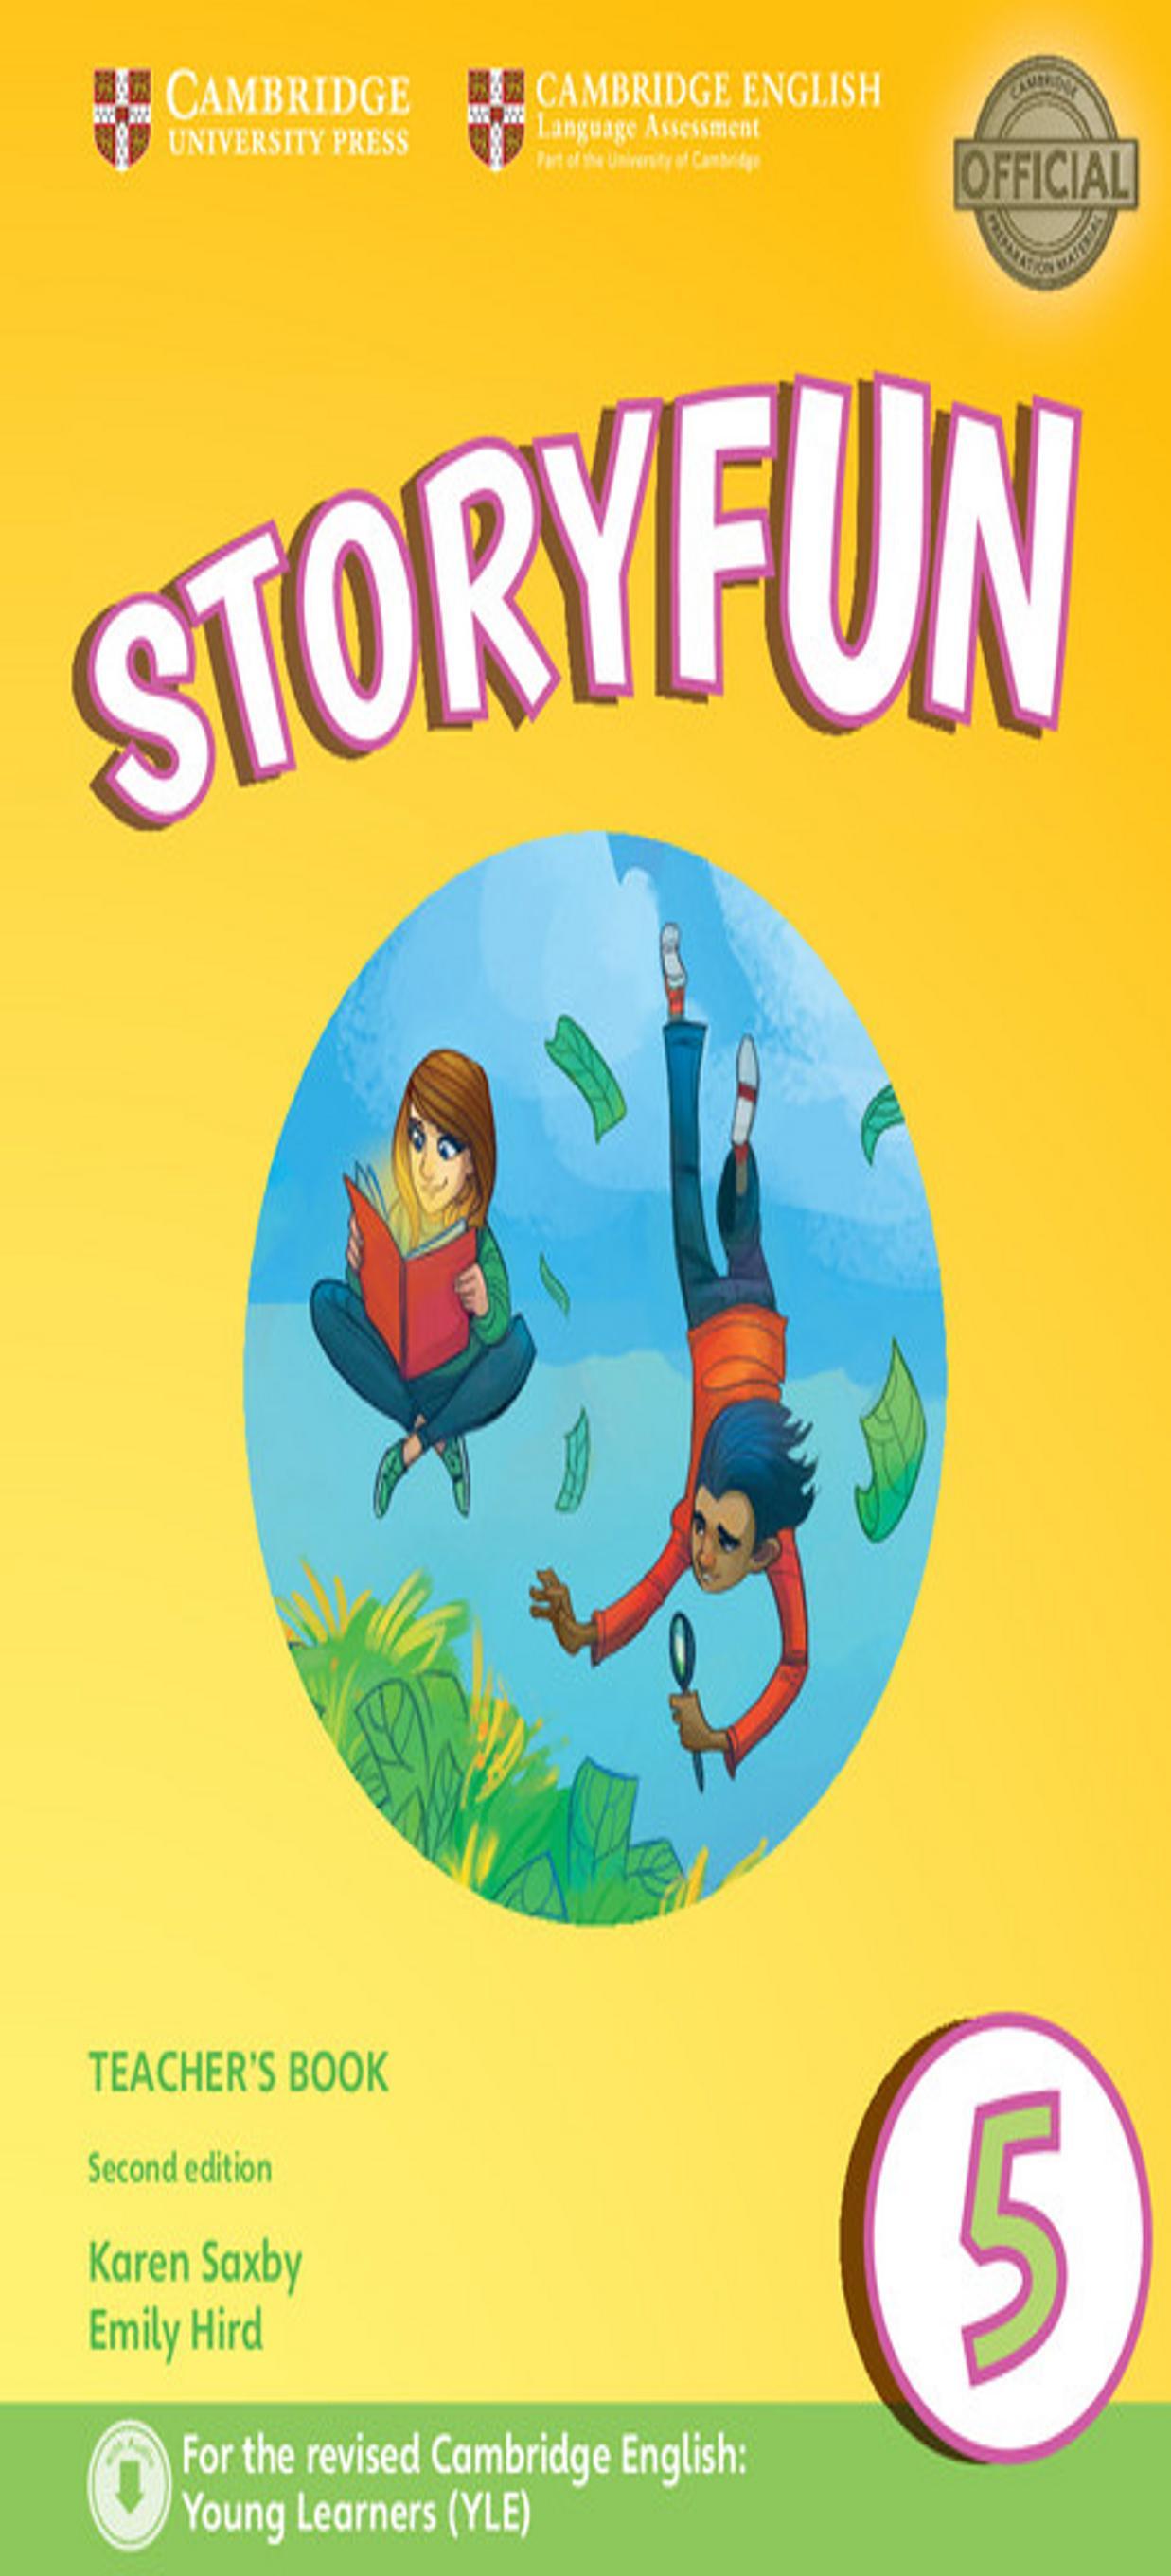 STORYFUN 5 TB + Audio 2nd Ed Revised